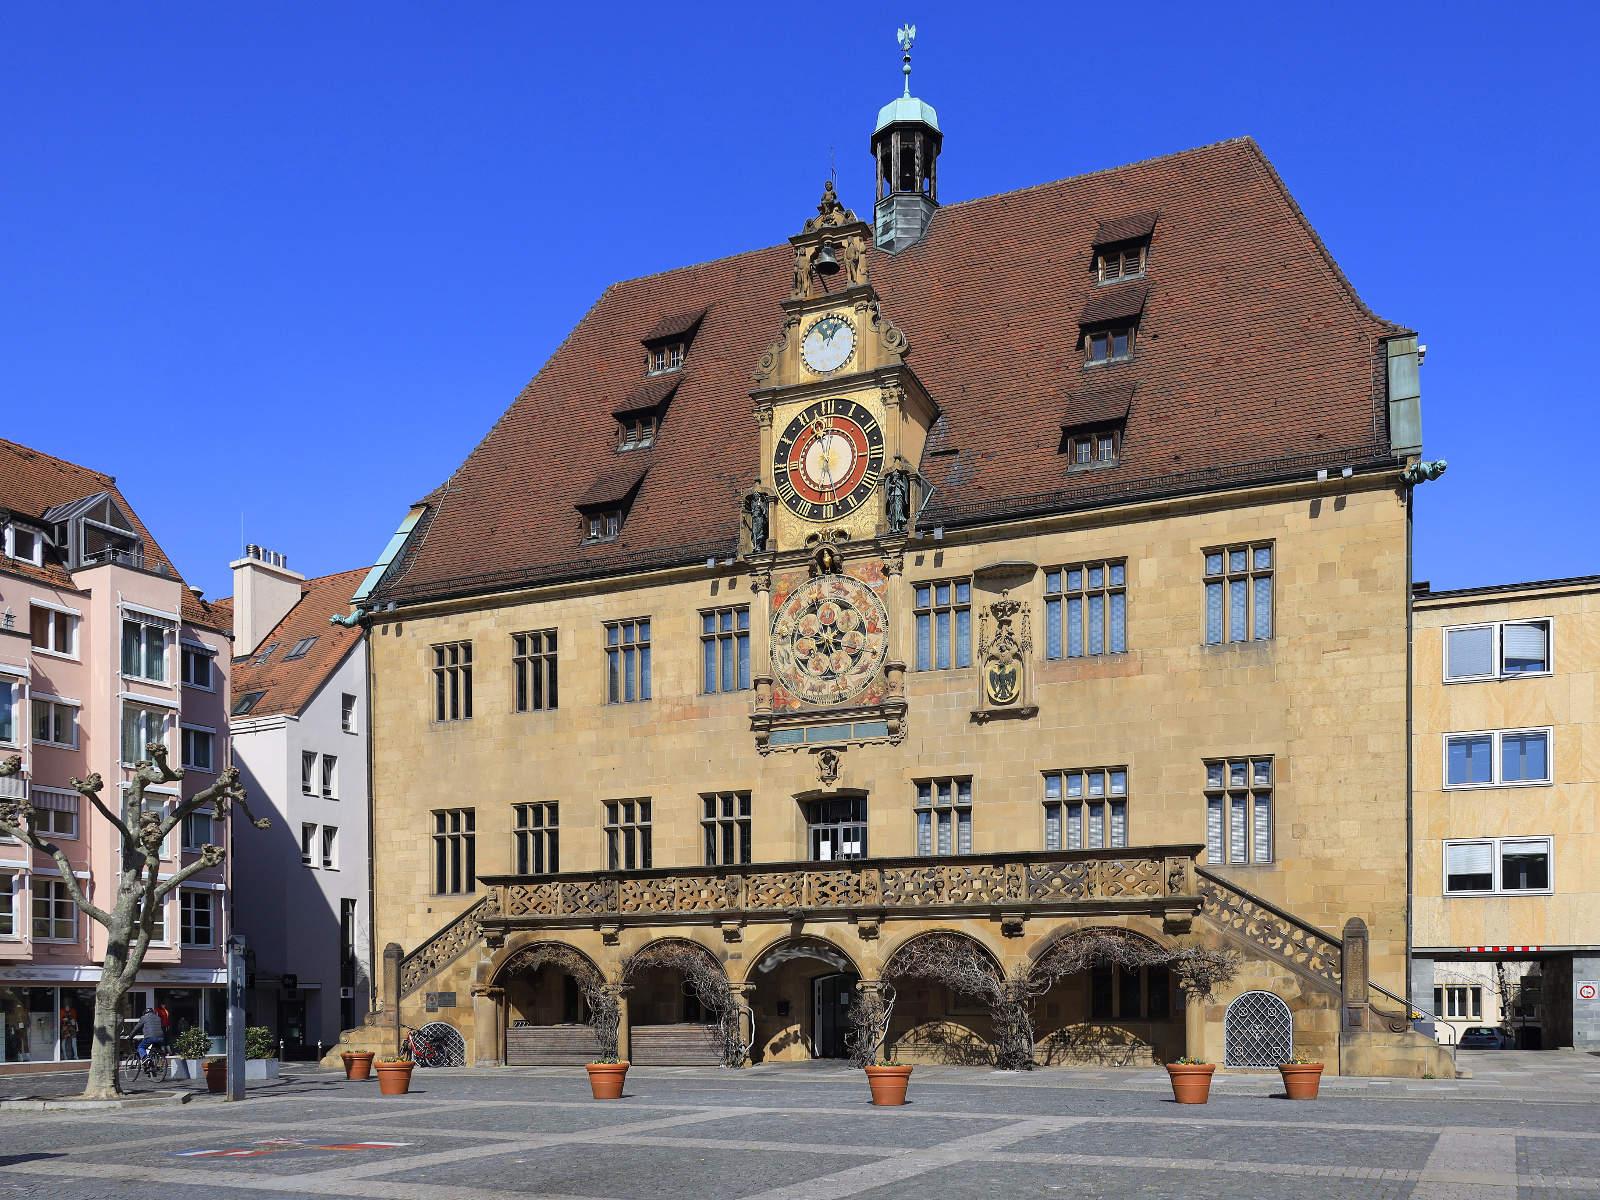 Stadtansicht Heilbronn - Rechtsanwälte für Immobilienrecht Fichter & Kollegen